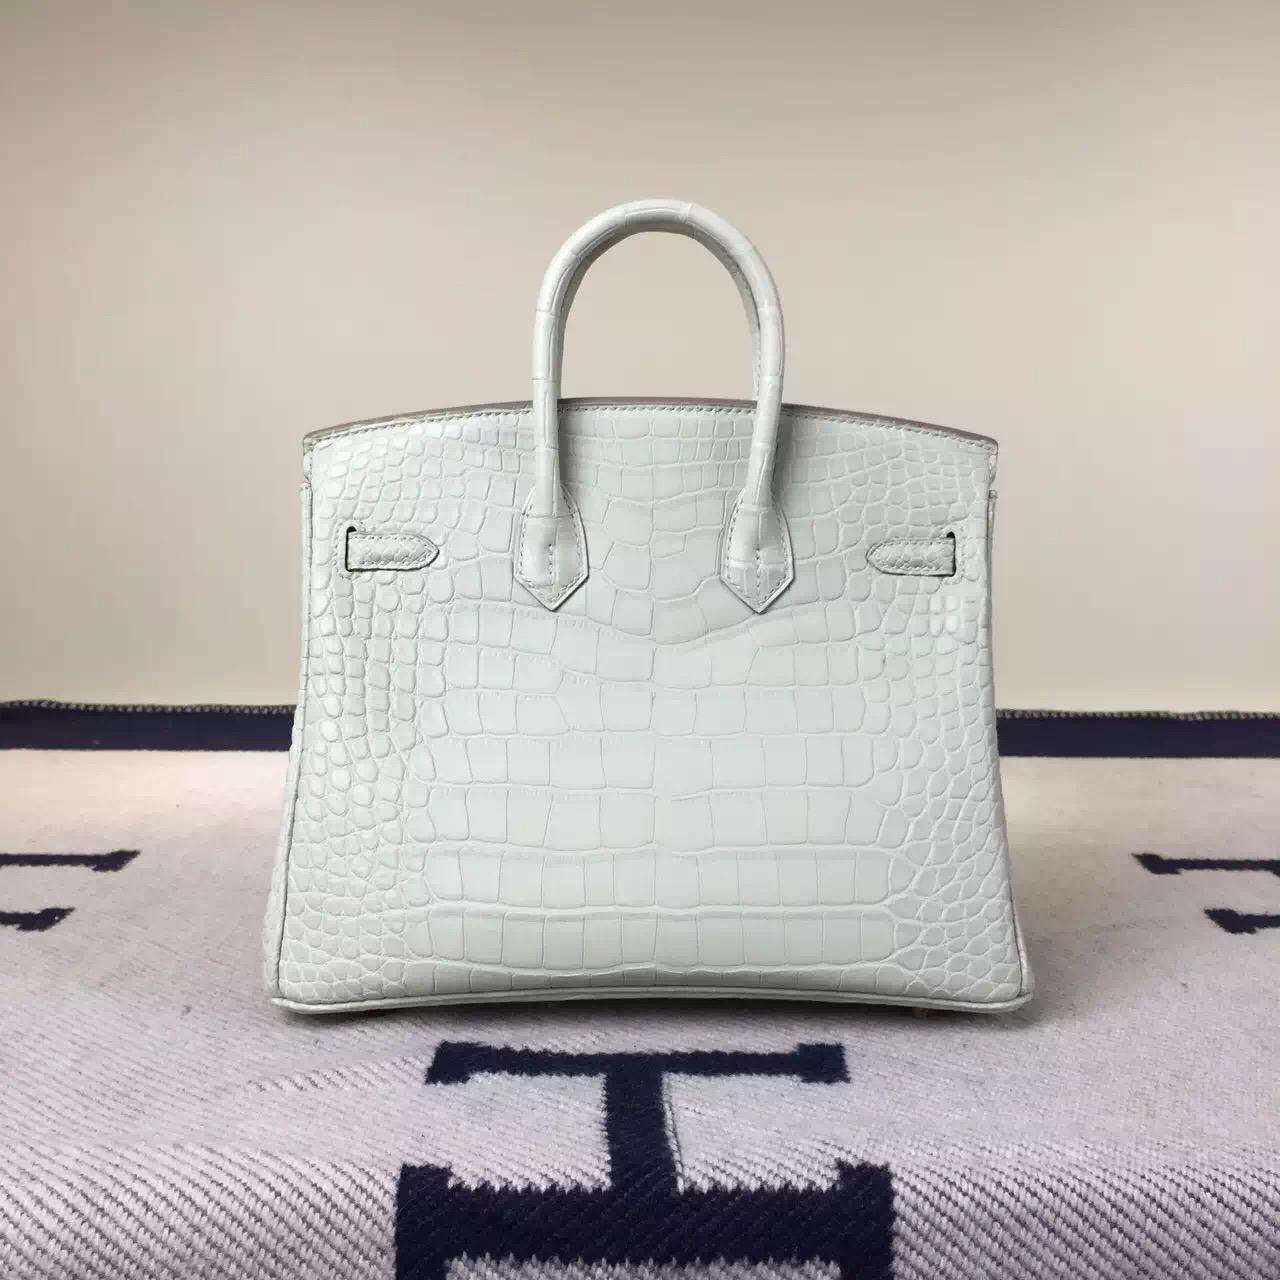 Wholesale Hermes Crocodile Matt Leather Birkin25cm in 8L Beton White